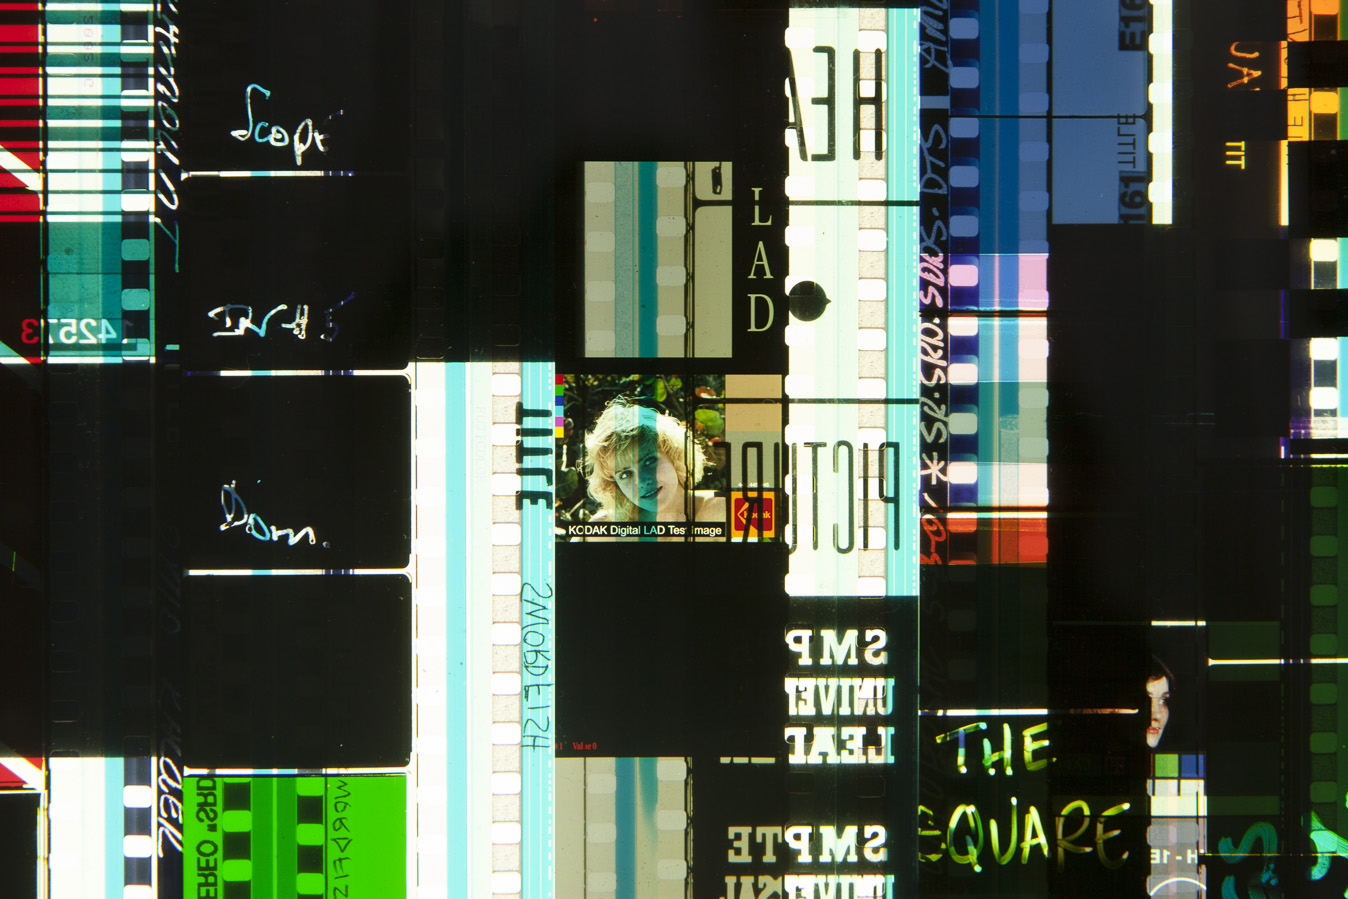 Ascending Leaders 2.35mm Celluloid Film, Fluorescent Lights, Custom Lightbox. 30x30x6. Richard Kerr. 2016. (Detail).